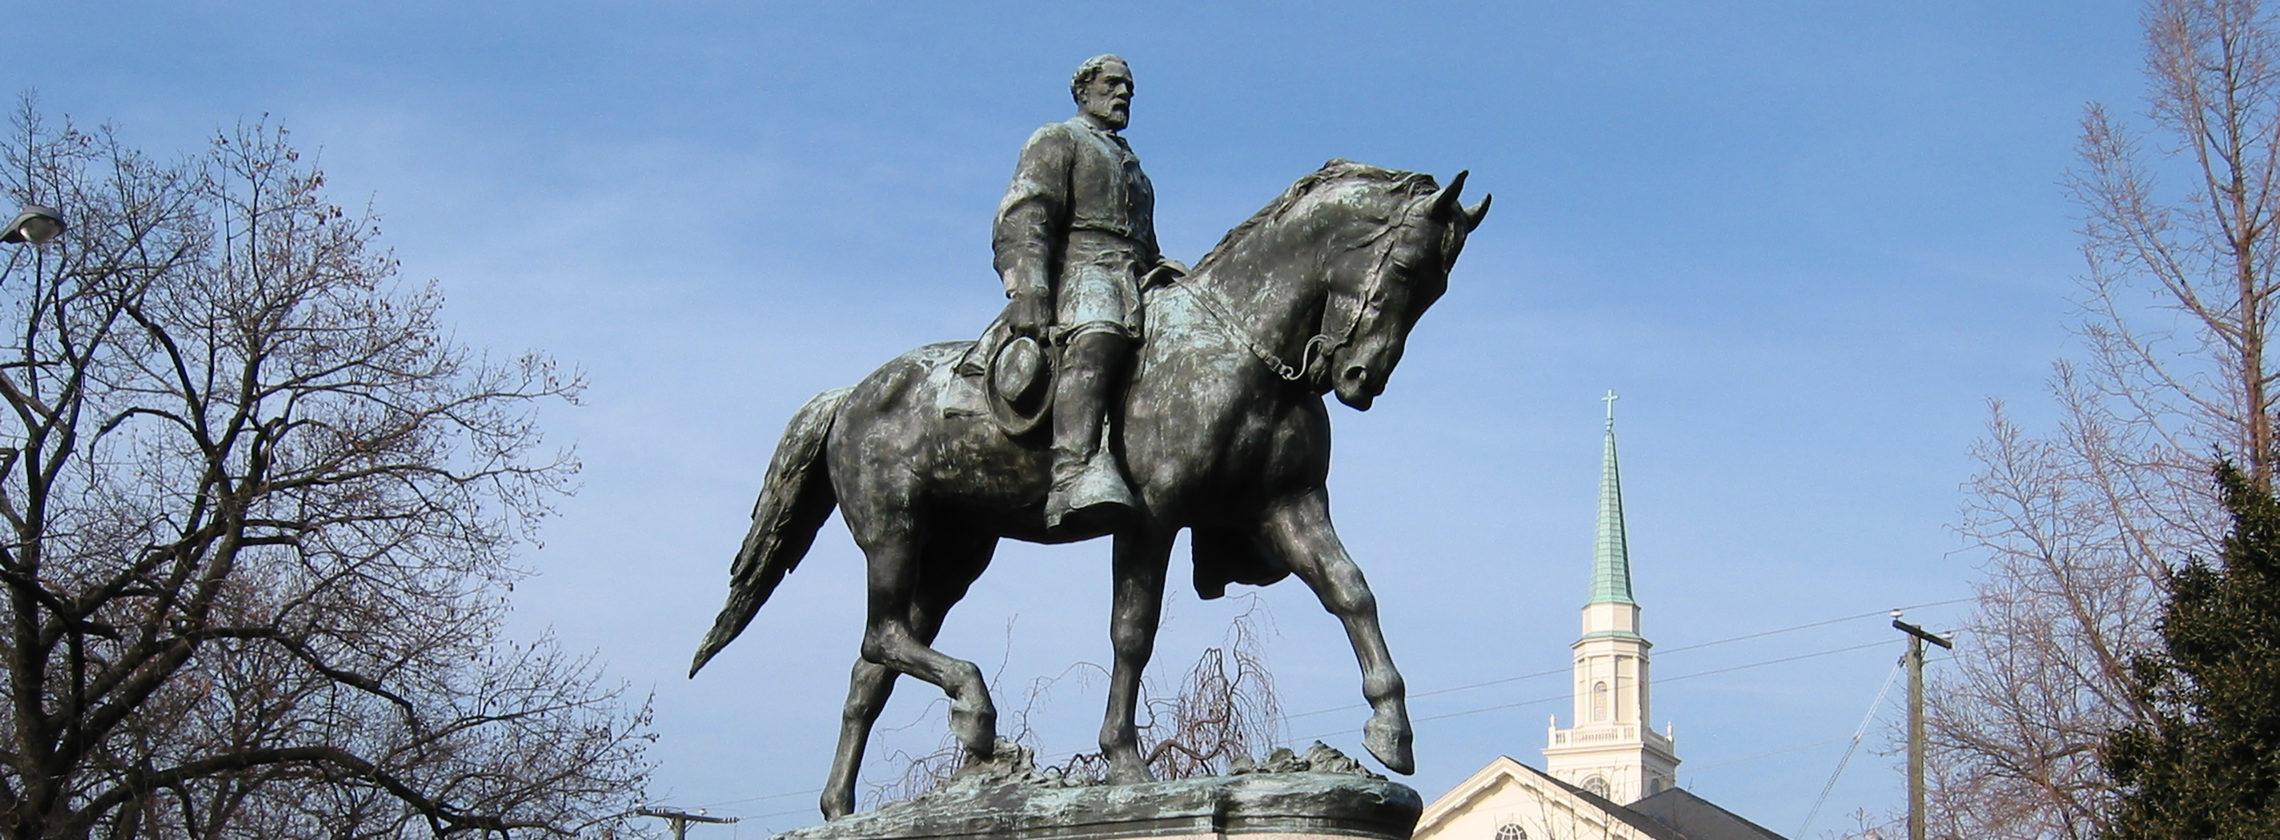 Liberals Lose Their Battle to Destroy Beloved Robert E. Lee Statue